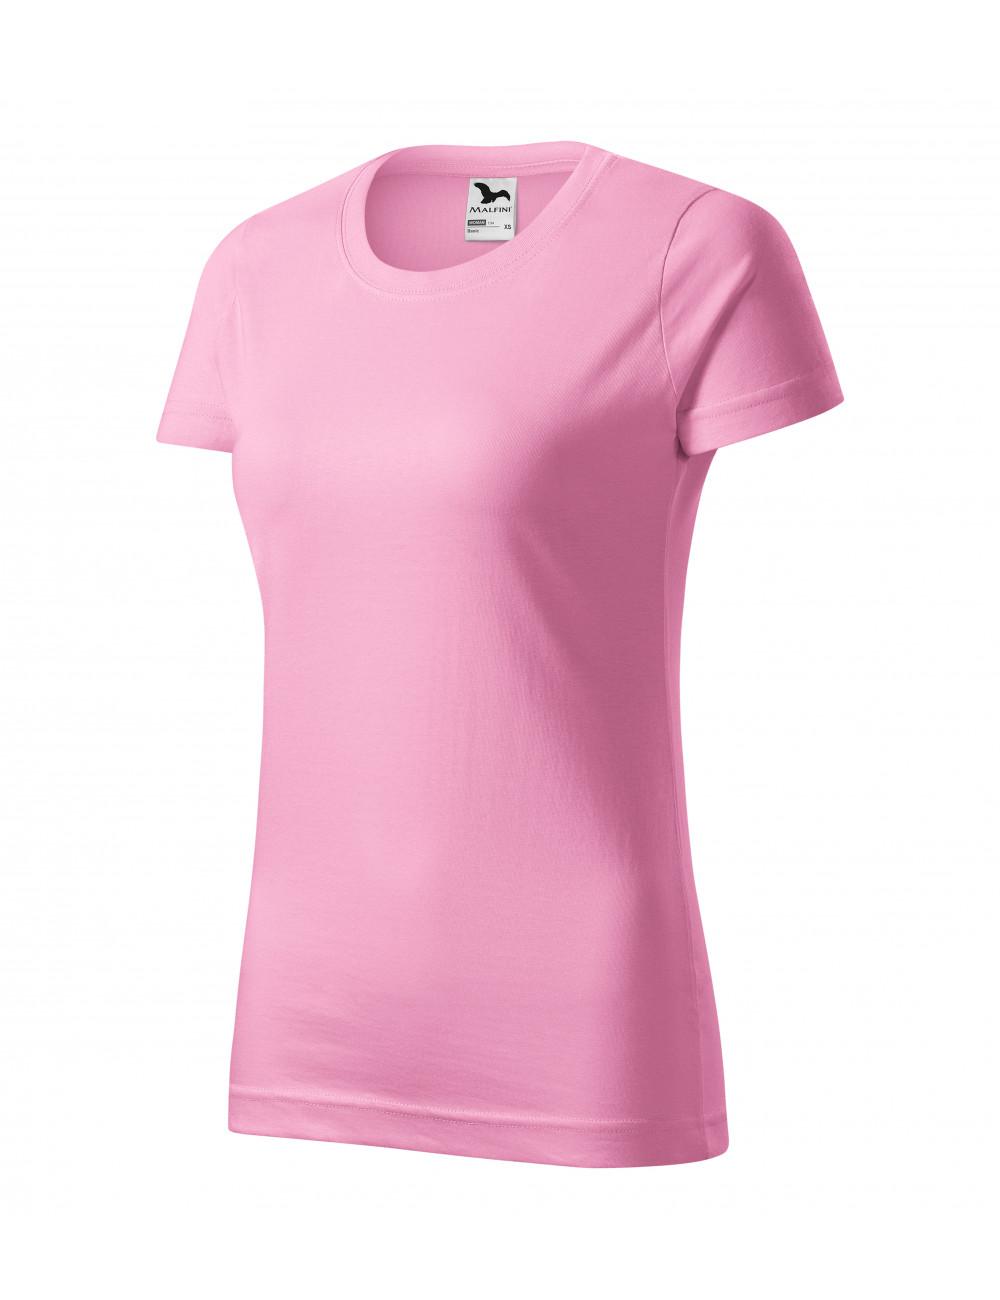 Adler MALFINI Koszulka damska Basic 134 różowy